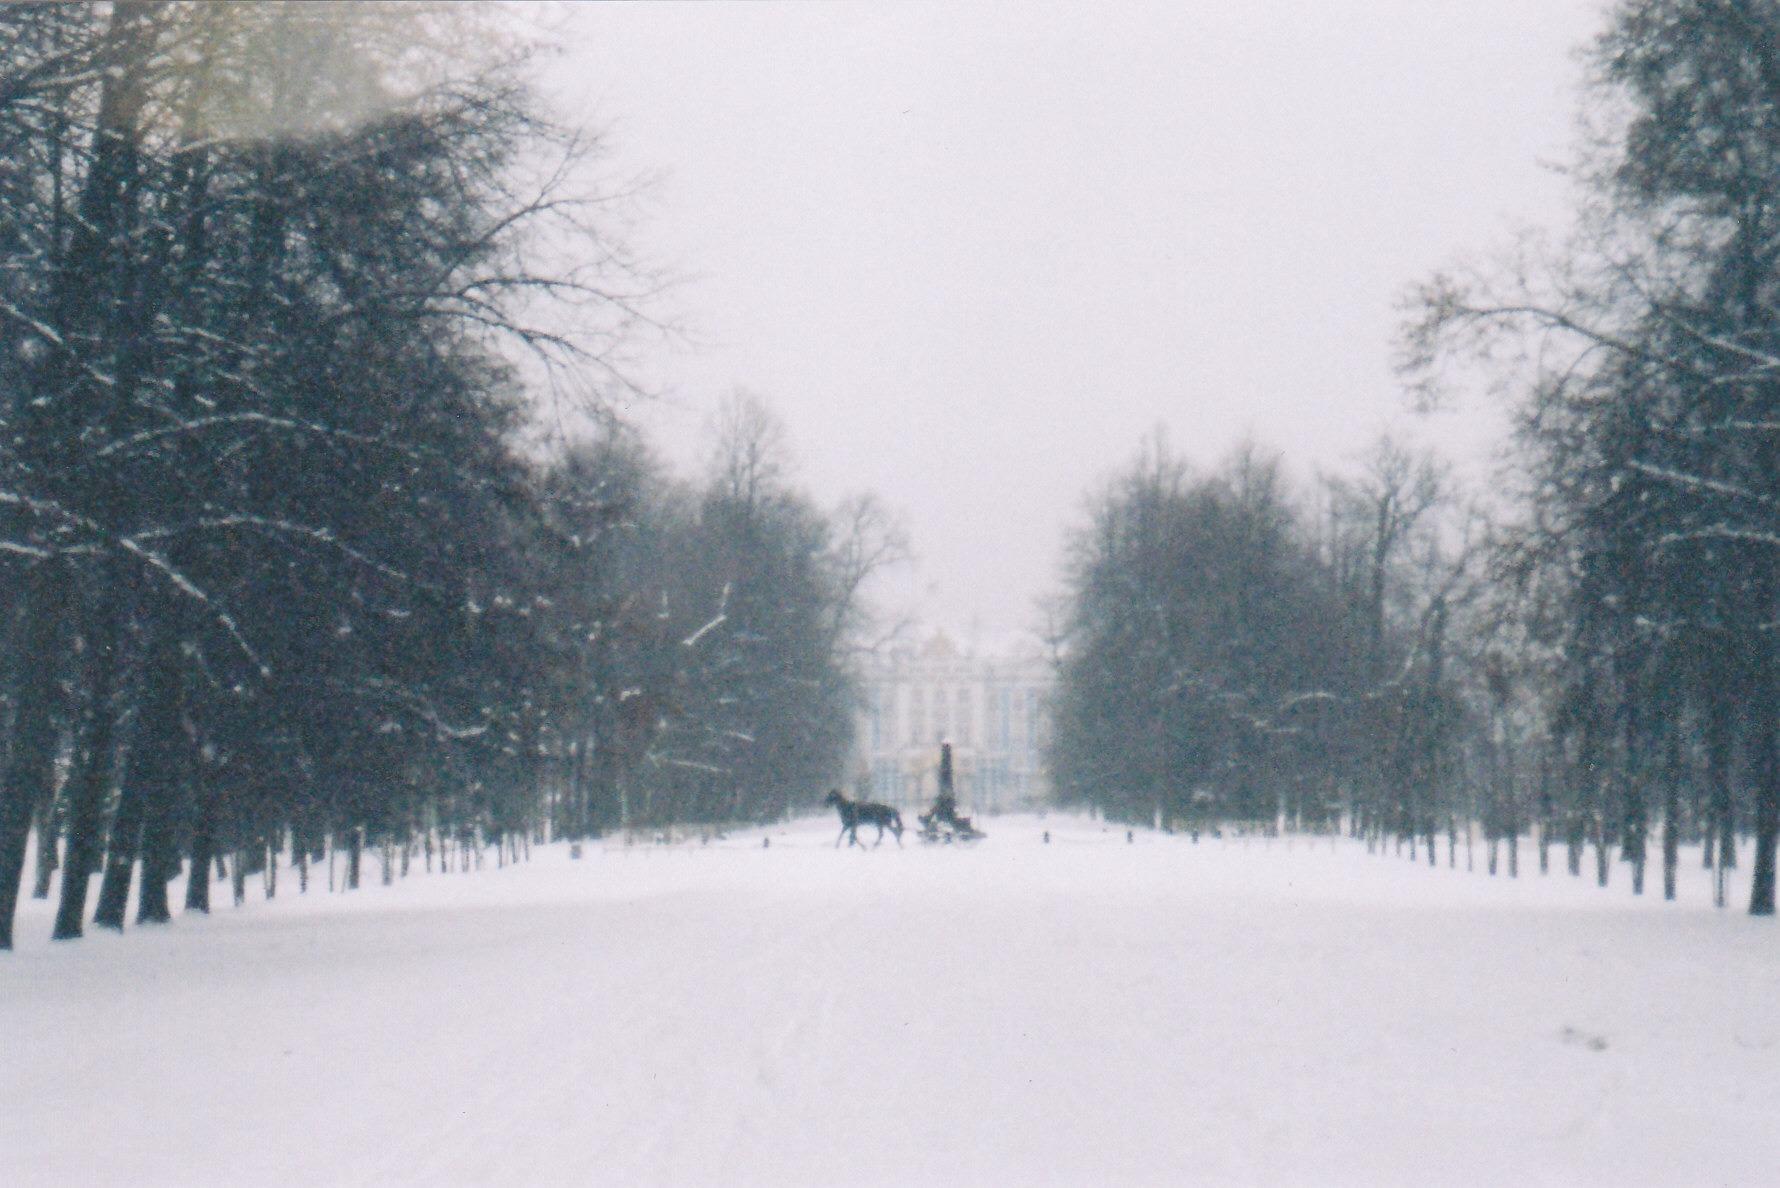 A rare snowy day